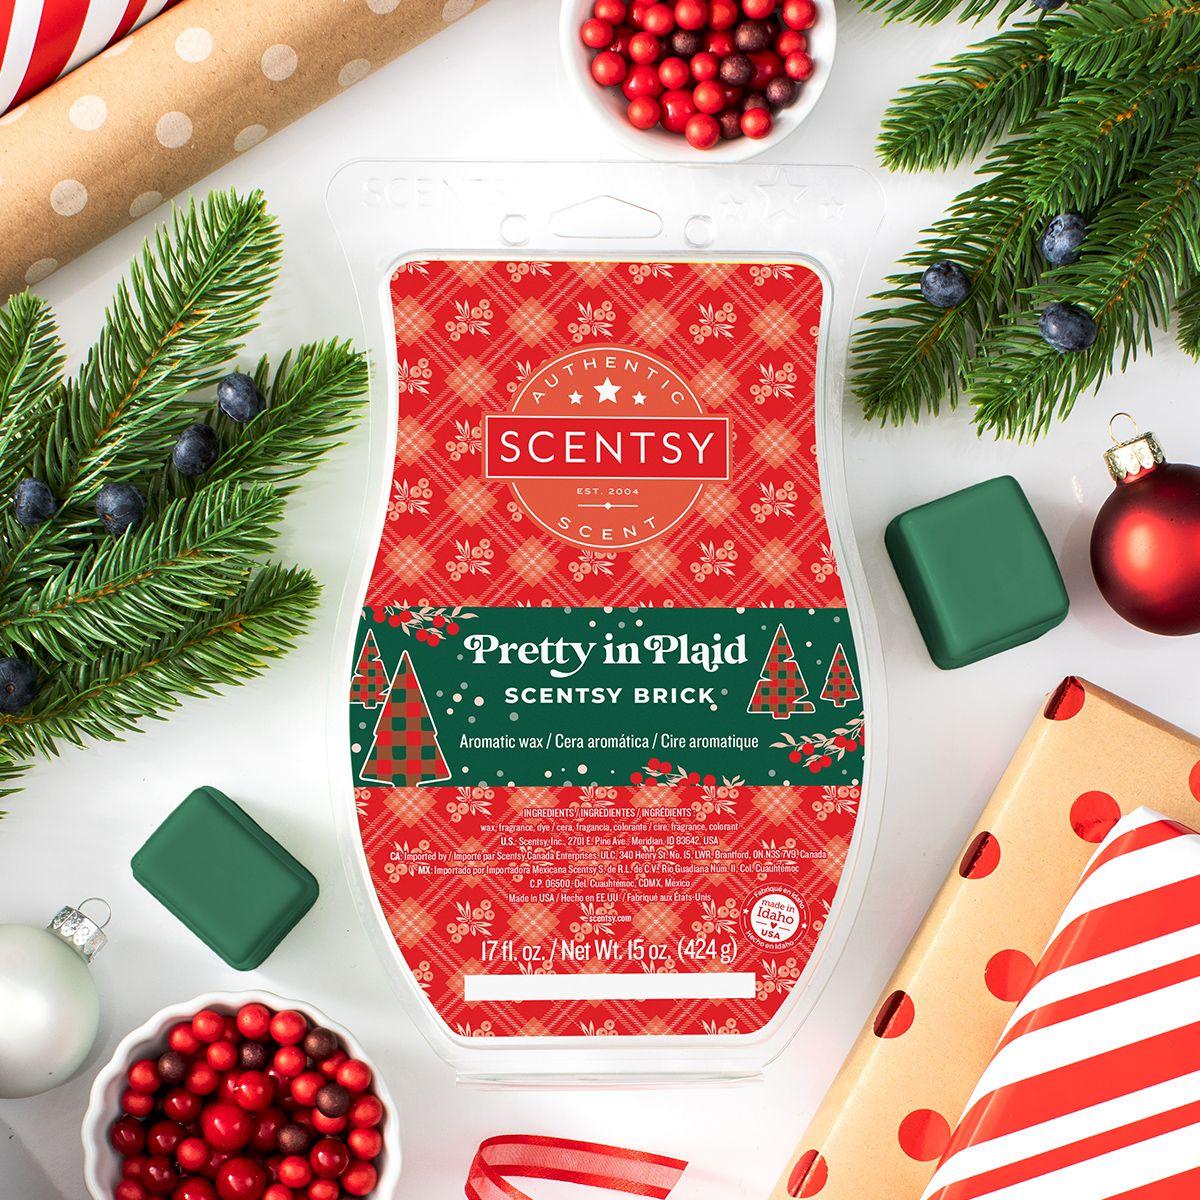 Pretty In Plaid Wax Brick Releases 11 1 In 2020 Scentsy Brick Scentsy Seasonal Scents